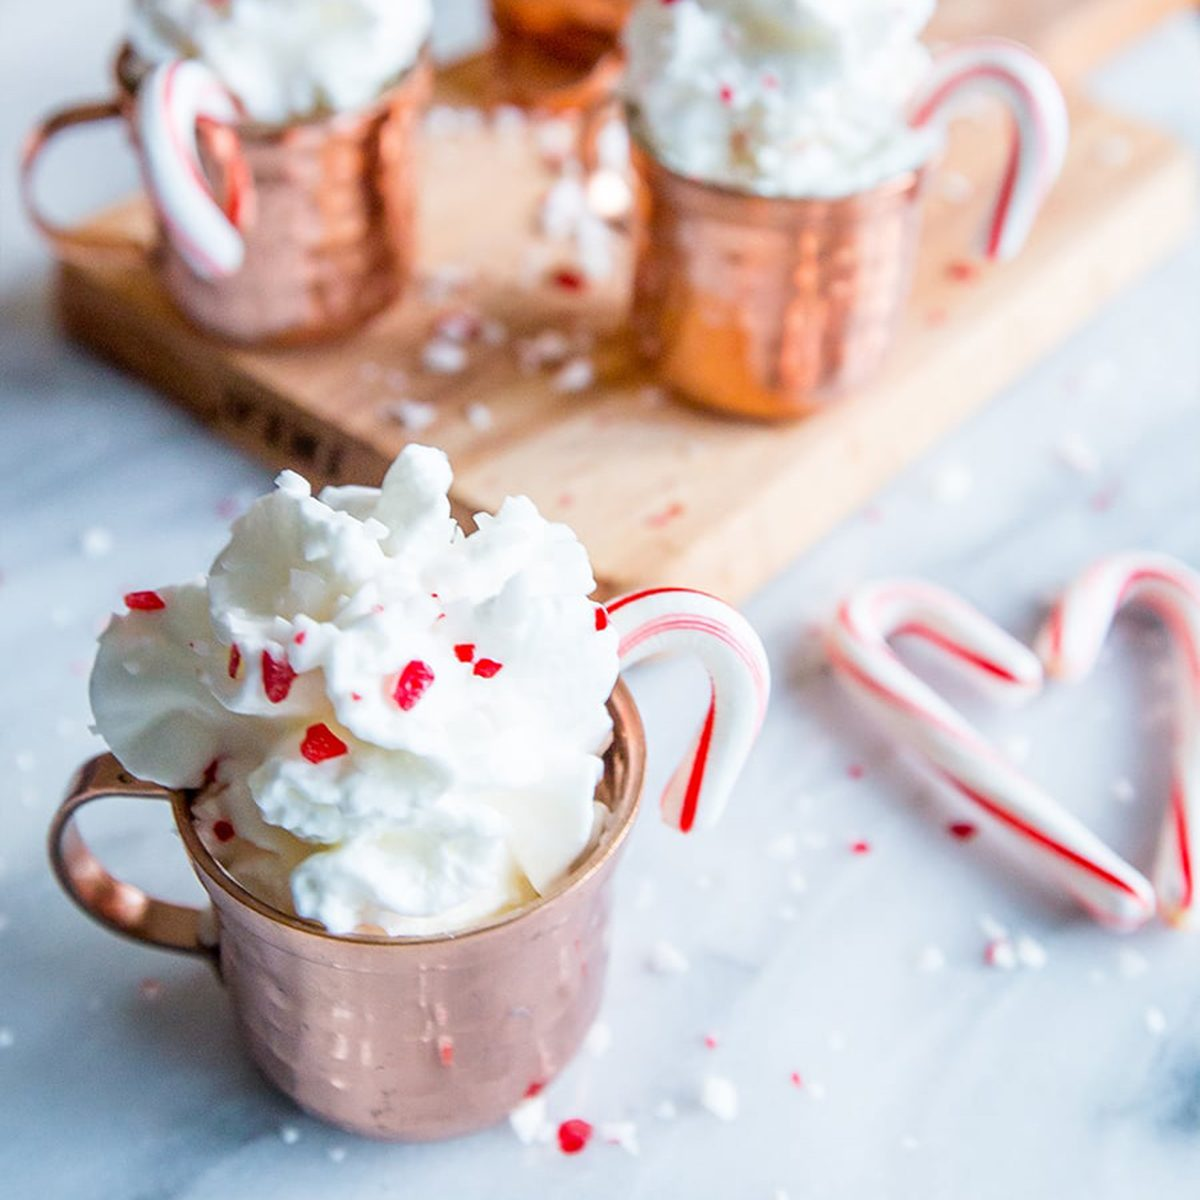 Peppermint-cocoa-shots